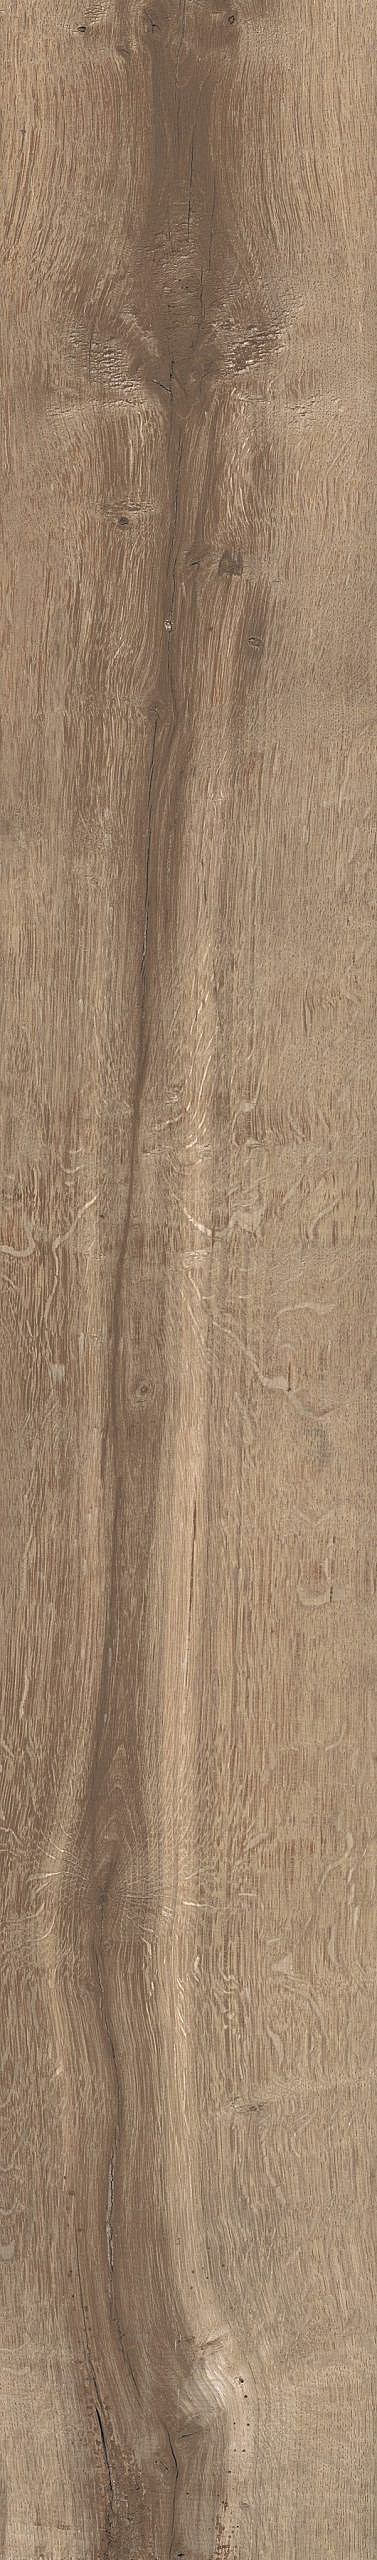 Potenza-Beige-26,5x180